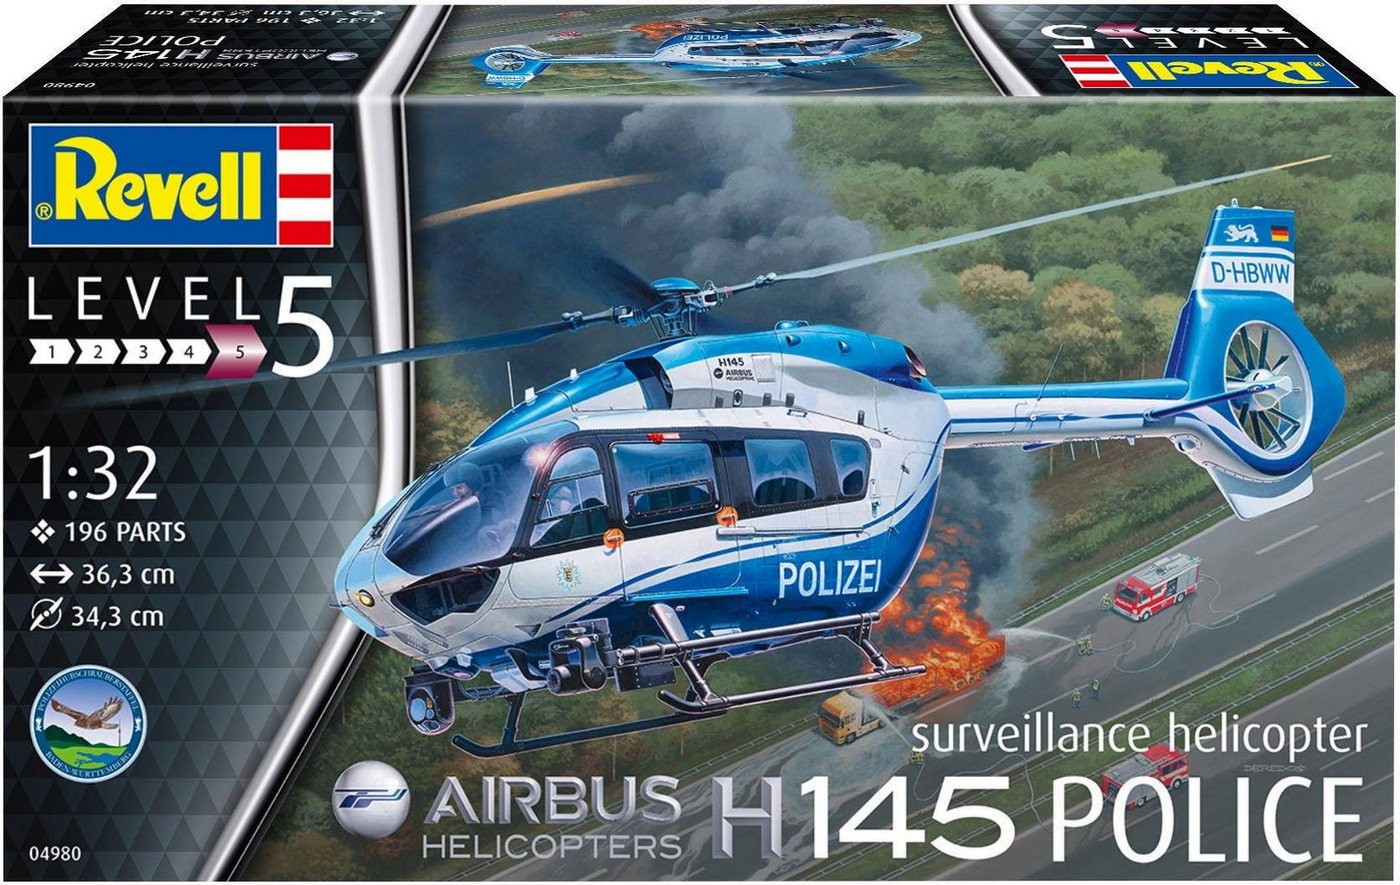 Revell Modellbausatz Helikopter, Maßstab 1:32, »Airbus H145 - Polizei-Hubschrauber«